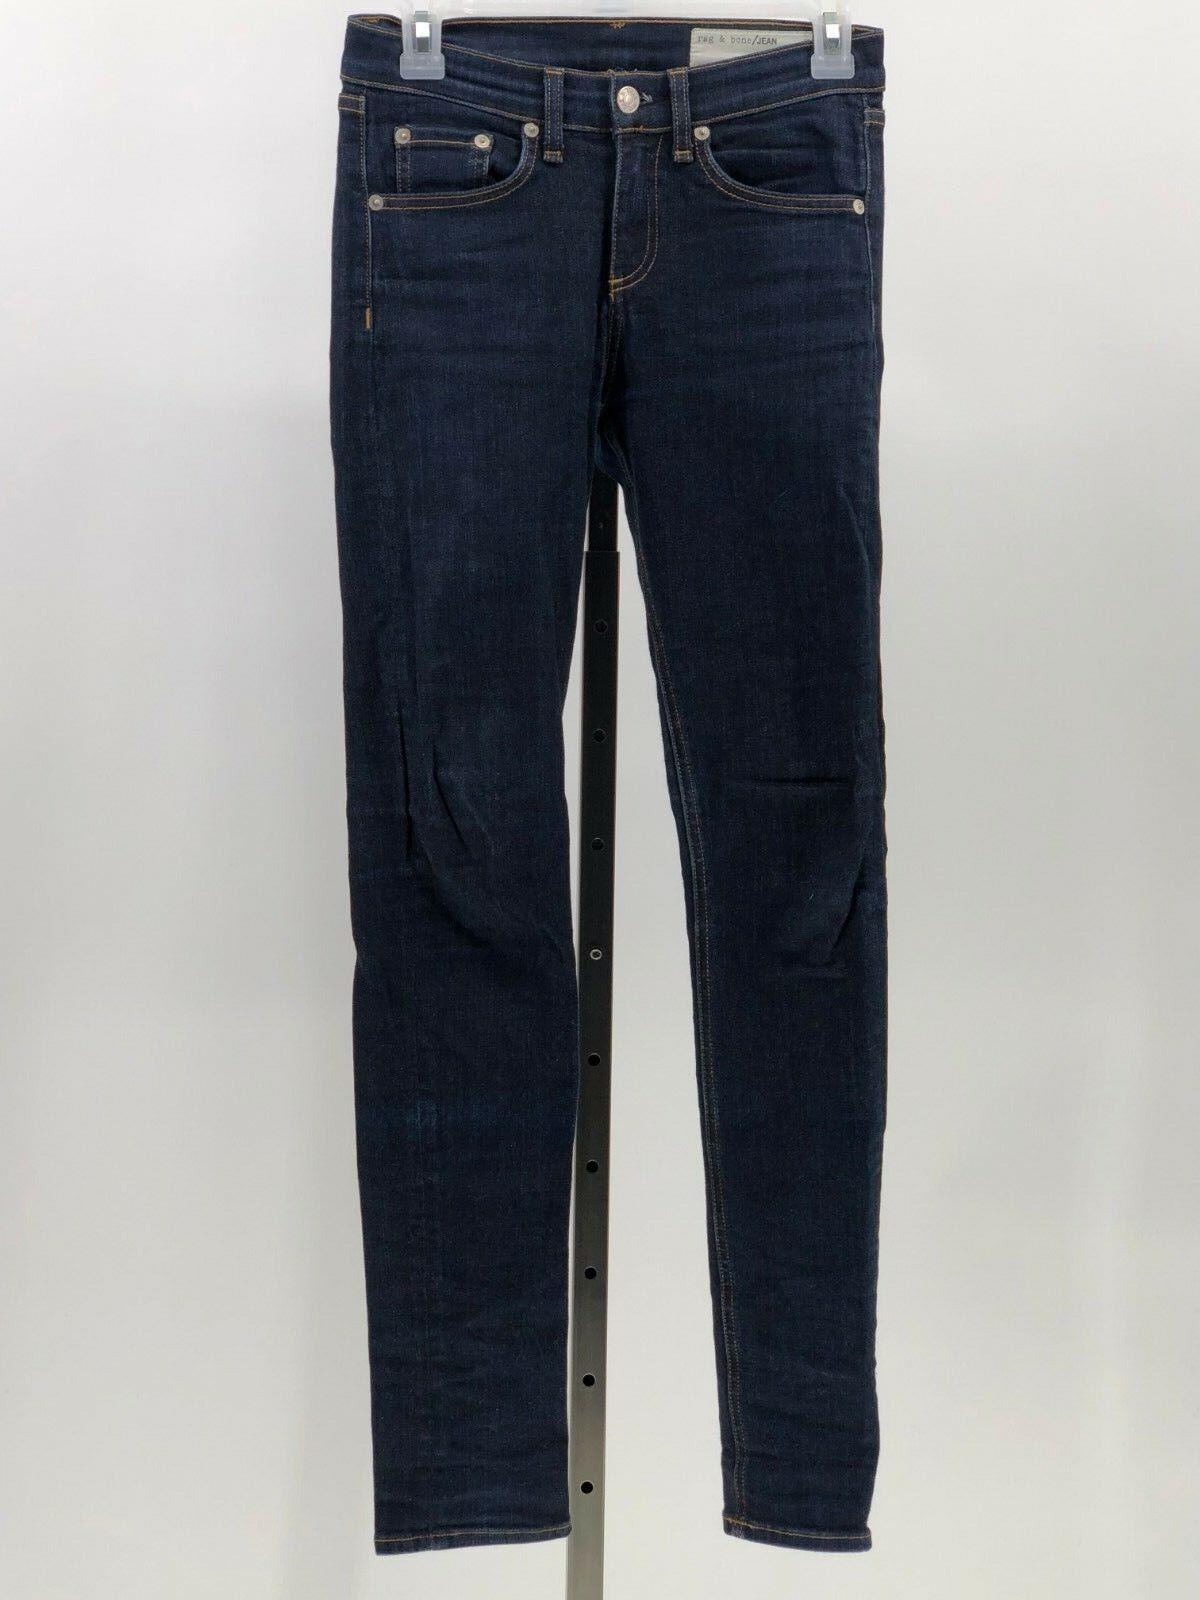 Rag & Bone High rise skinny jean jeans sz 25 EUC EI36